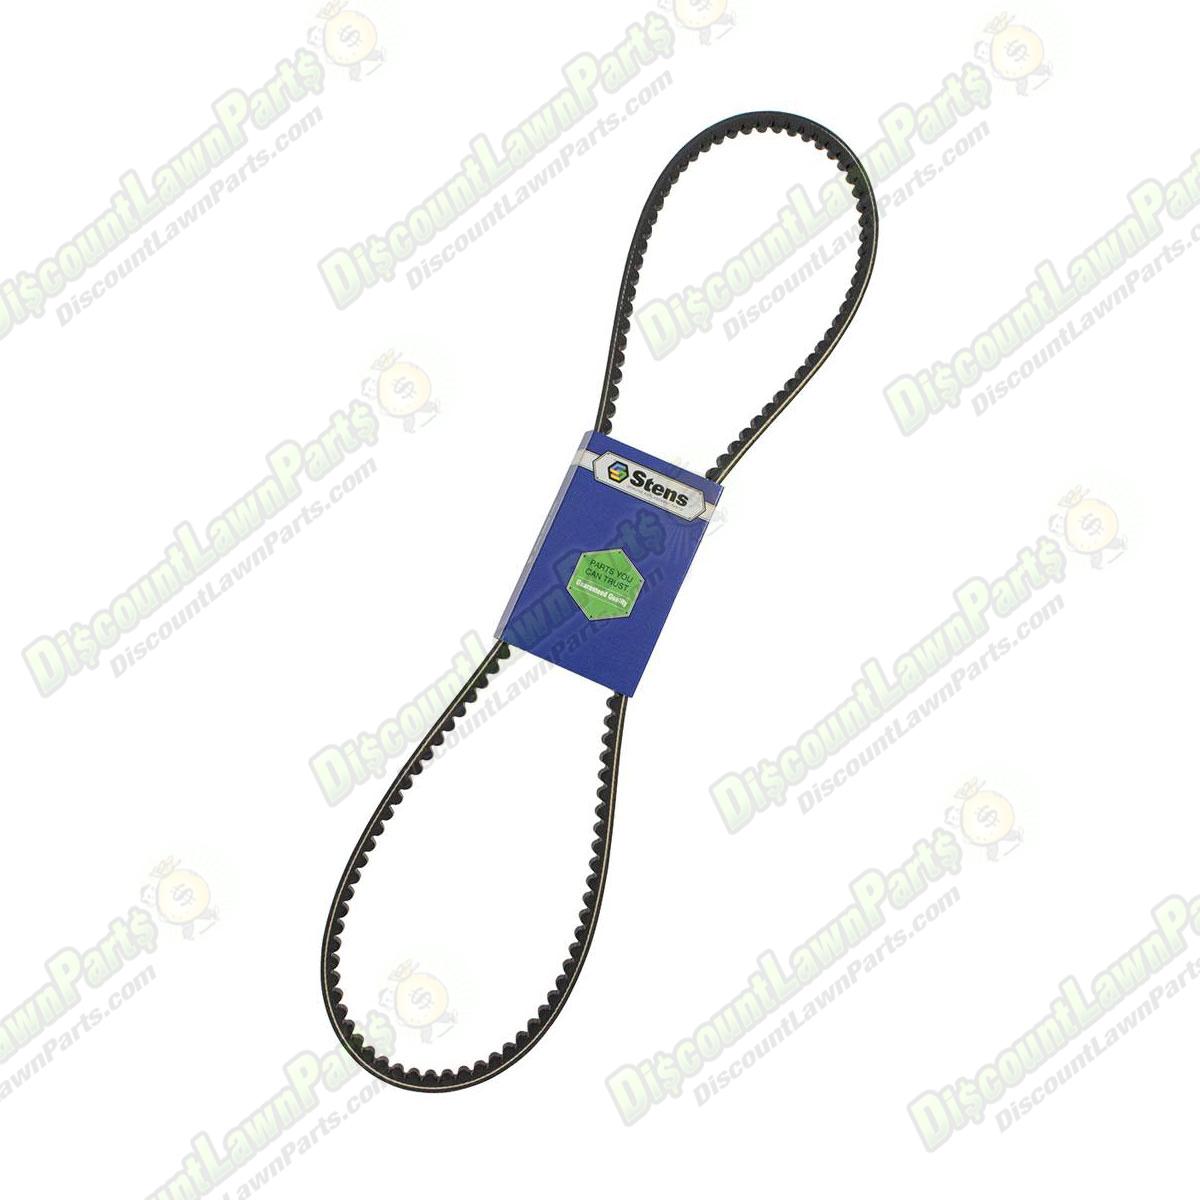 Oem Replacement Belt Exmark 109